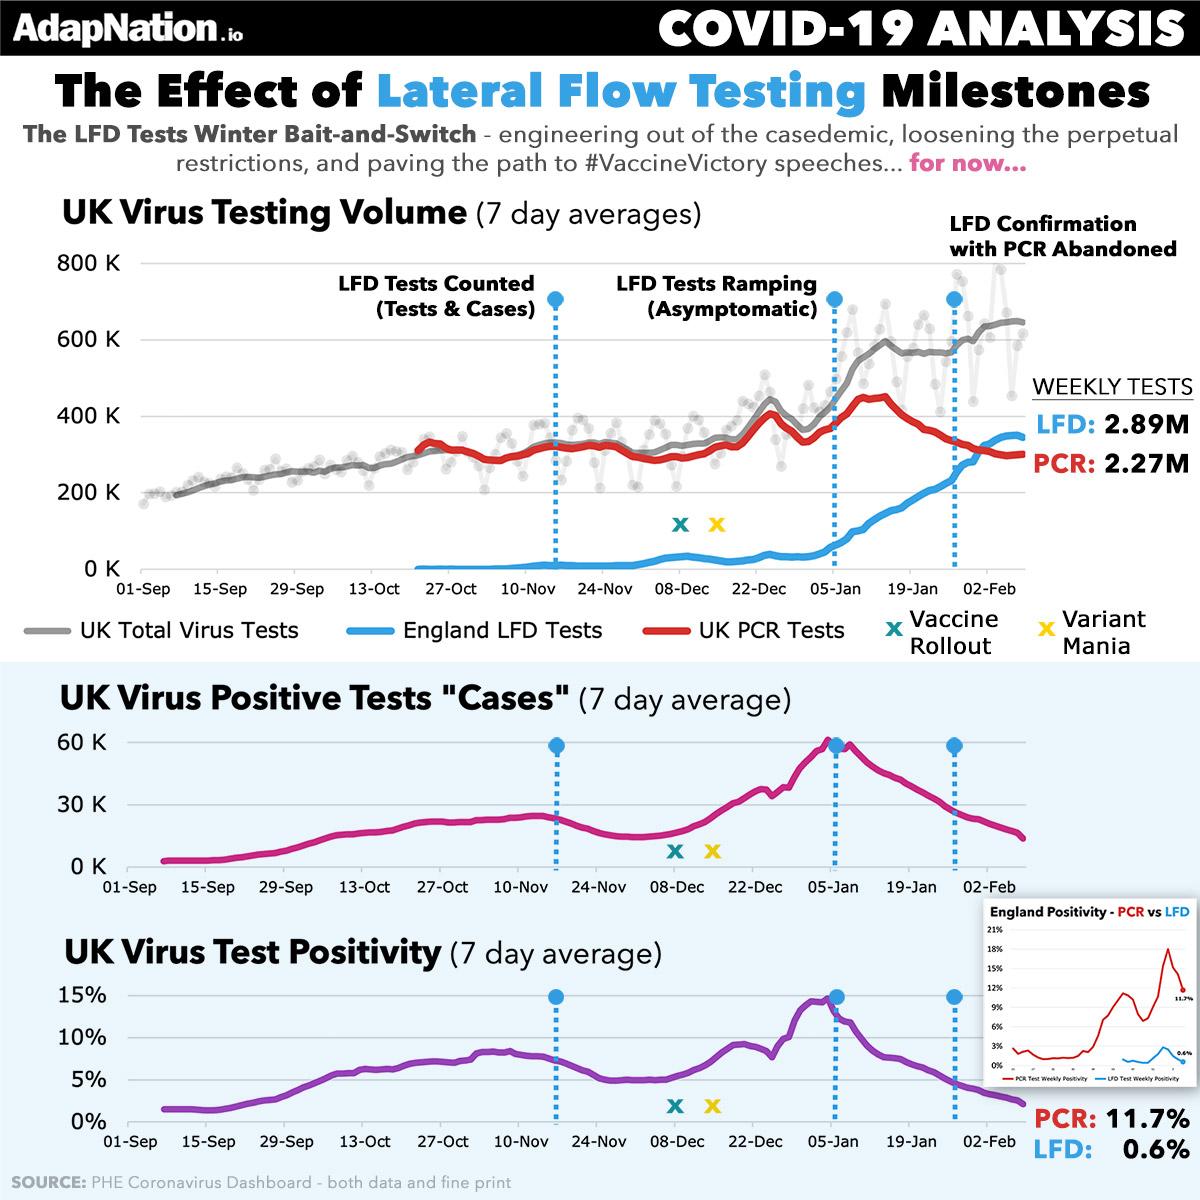 UK Govt pivoting to LFD Tests